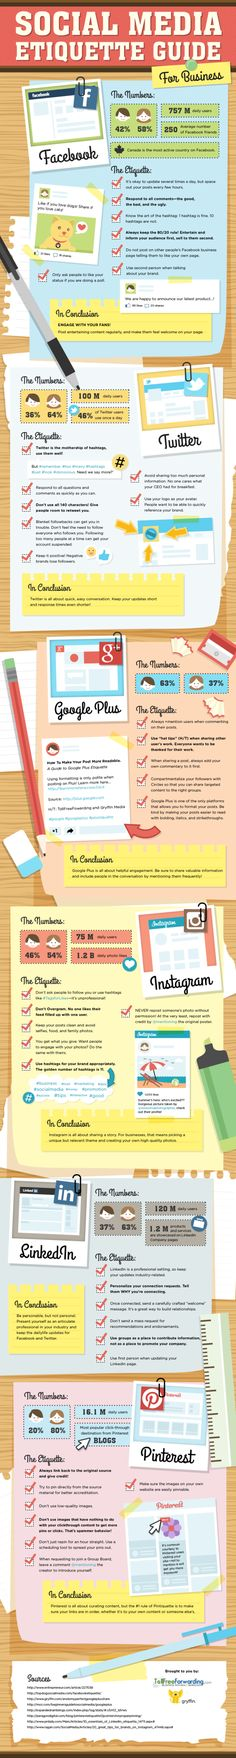 Social Media Etiquette Guide For Businesses (#Infographic)